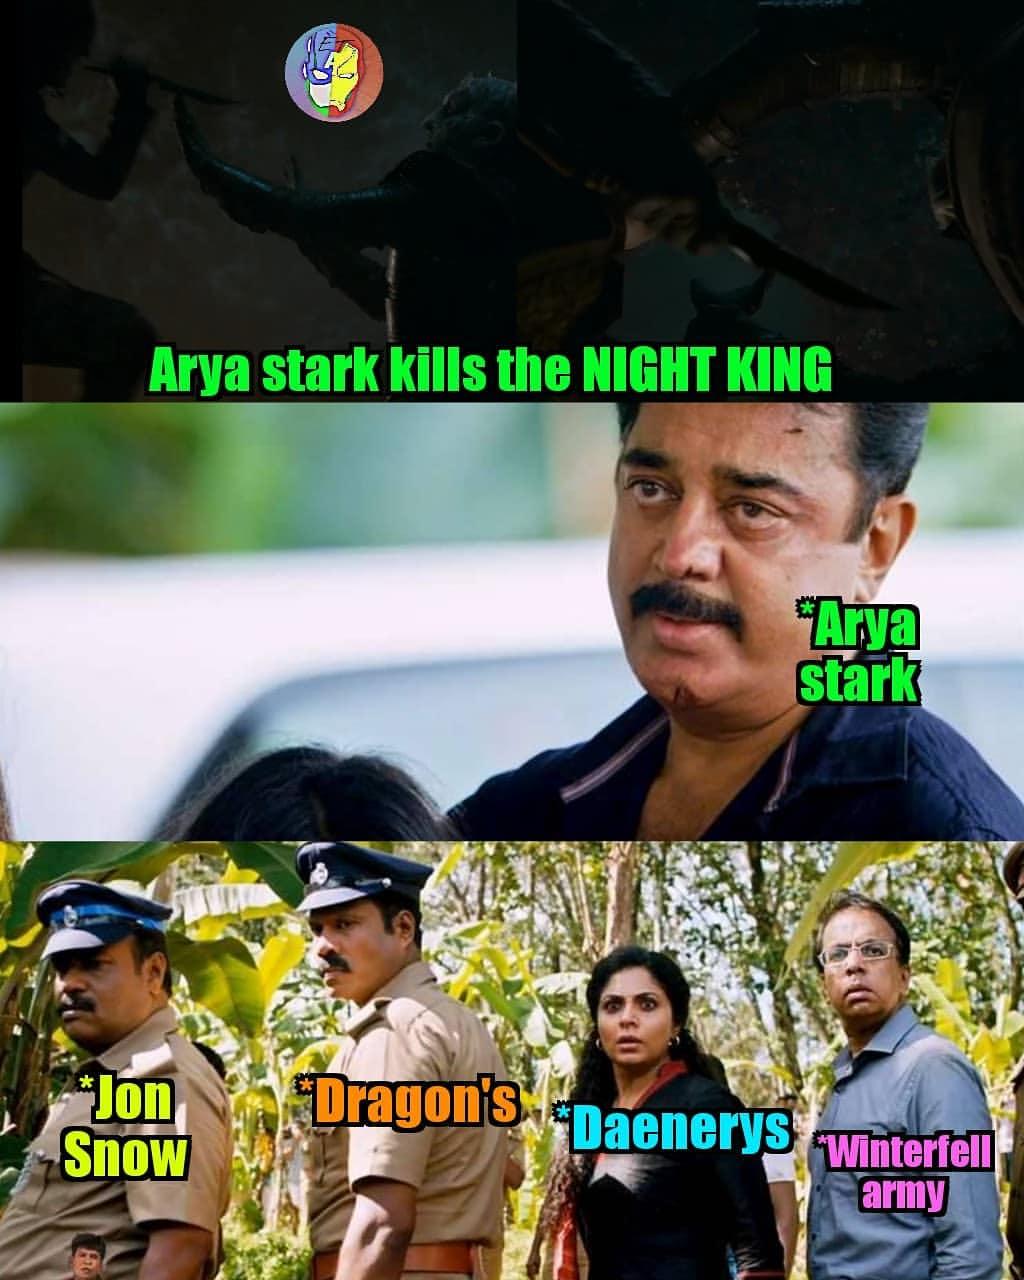 Arya Stark Kills The Night King Scene Meme Tamil Memes